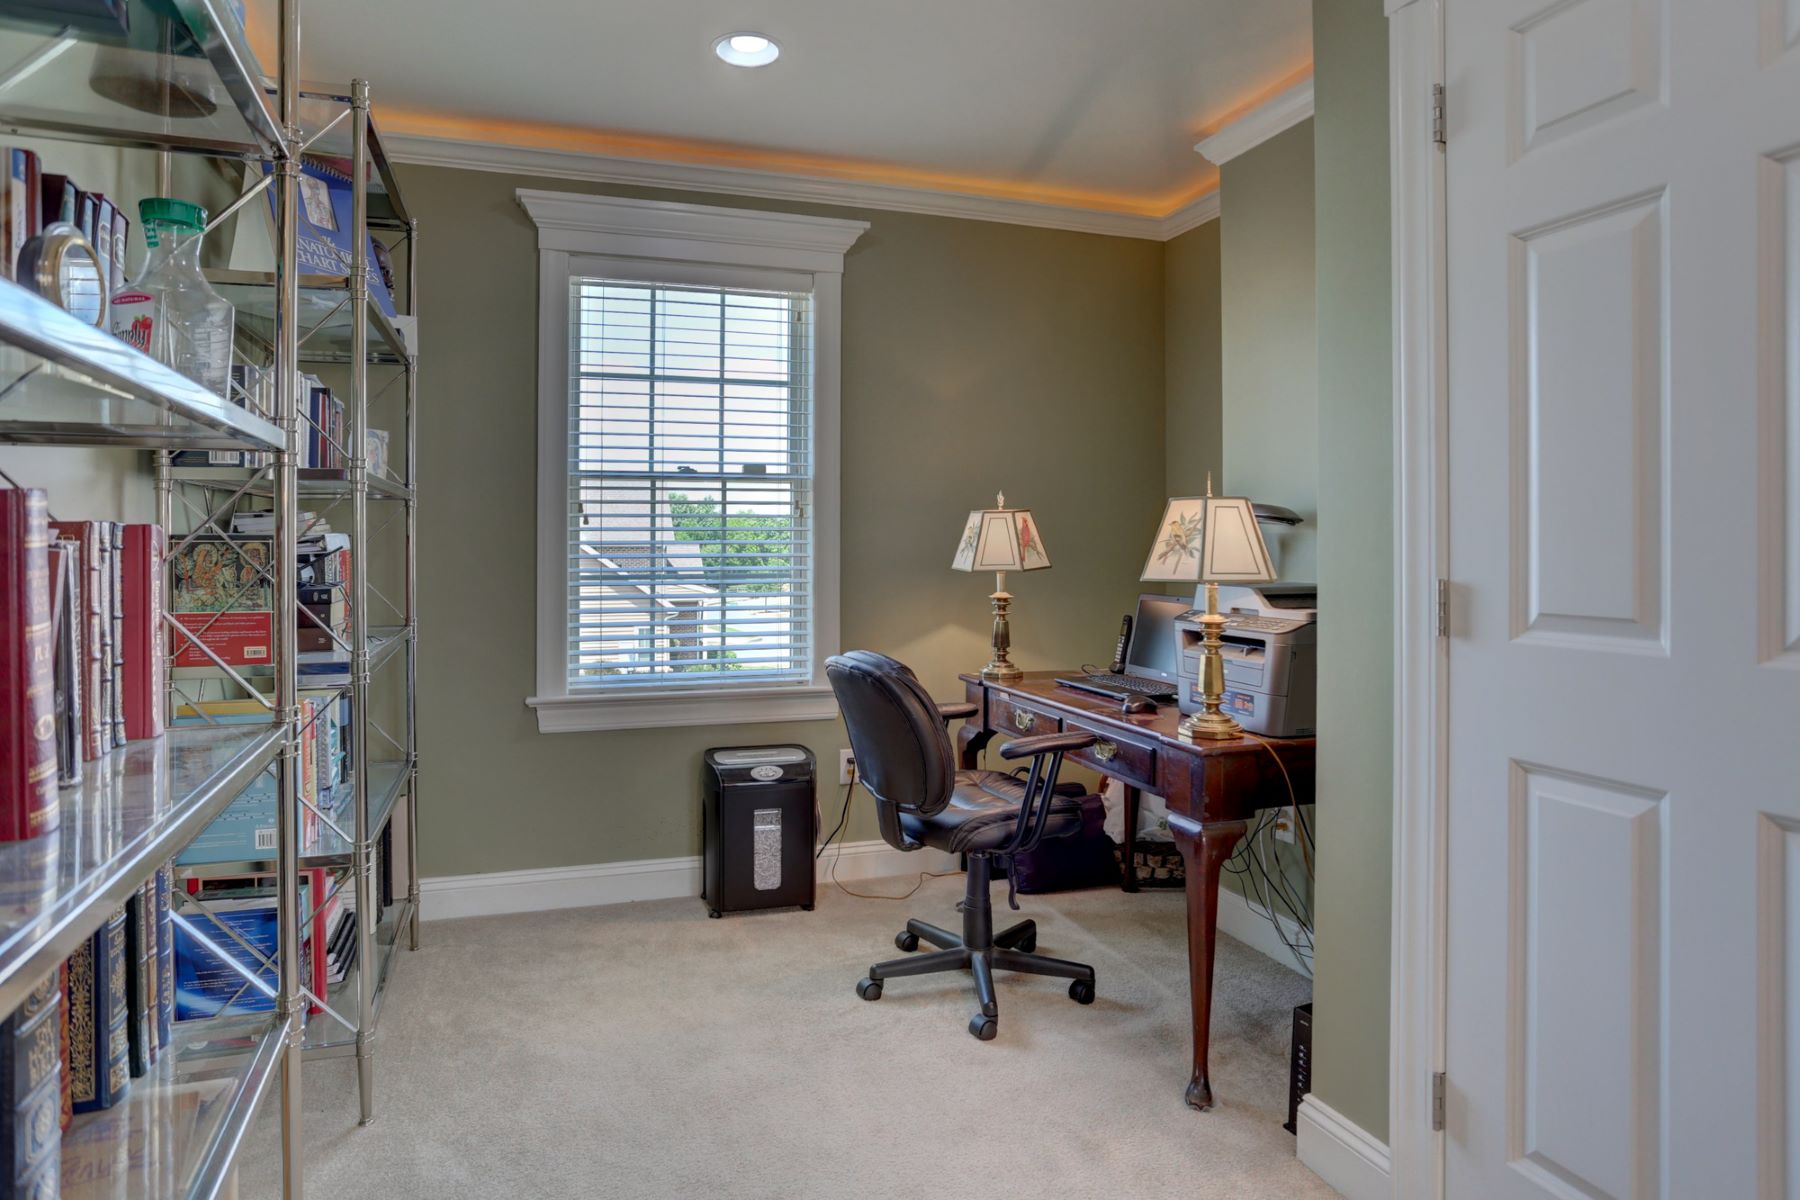 Additional photo for property listing at 652 Richmond Drive 652 Richmond Drive Lancaster, Pennsylvania 17601 Estados Unidos